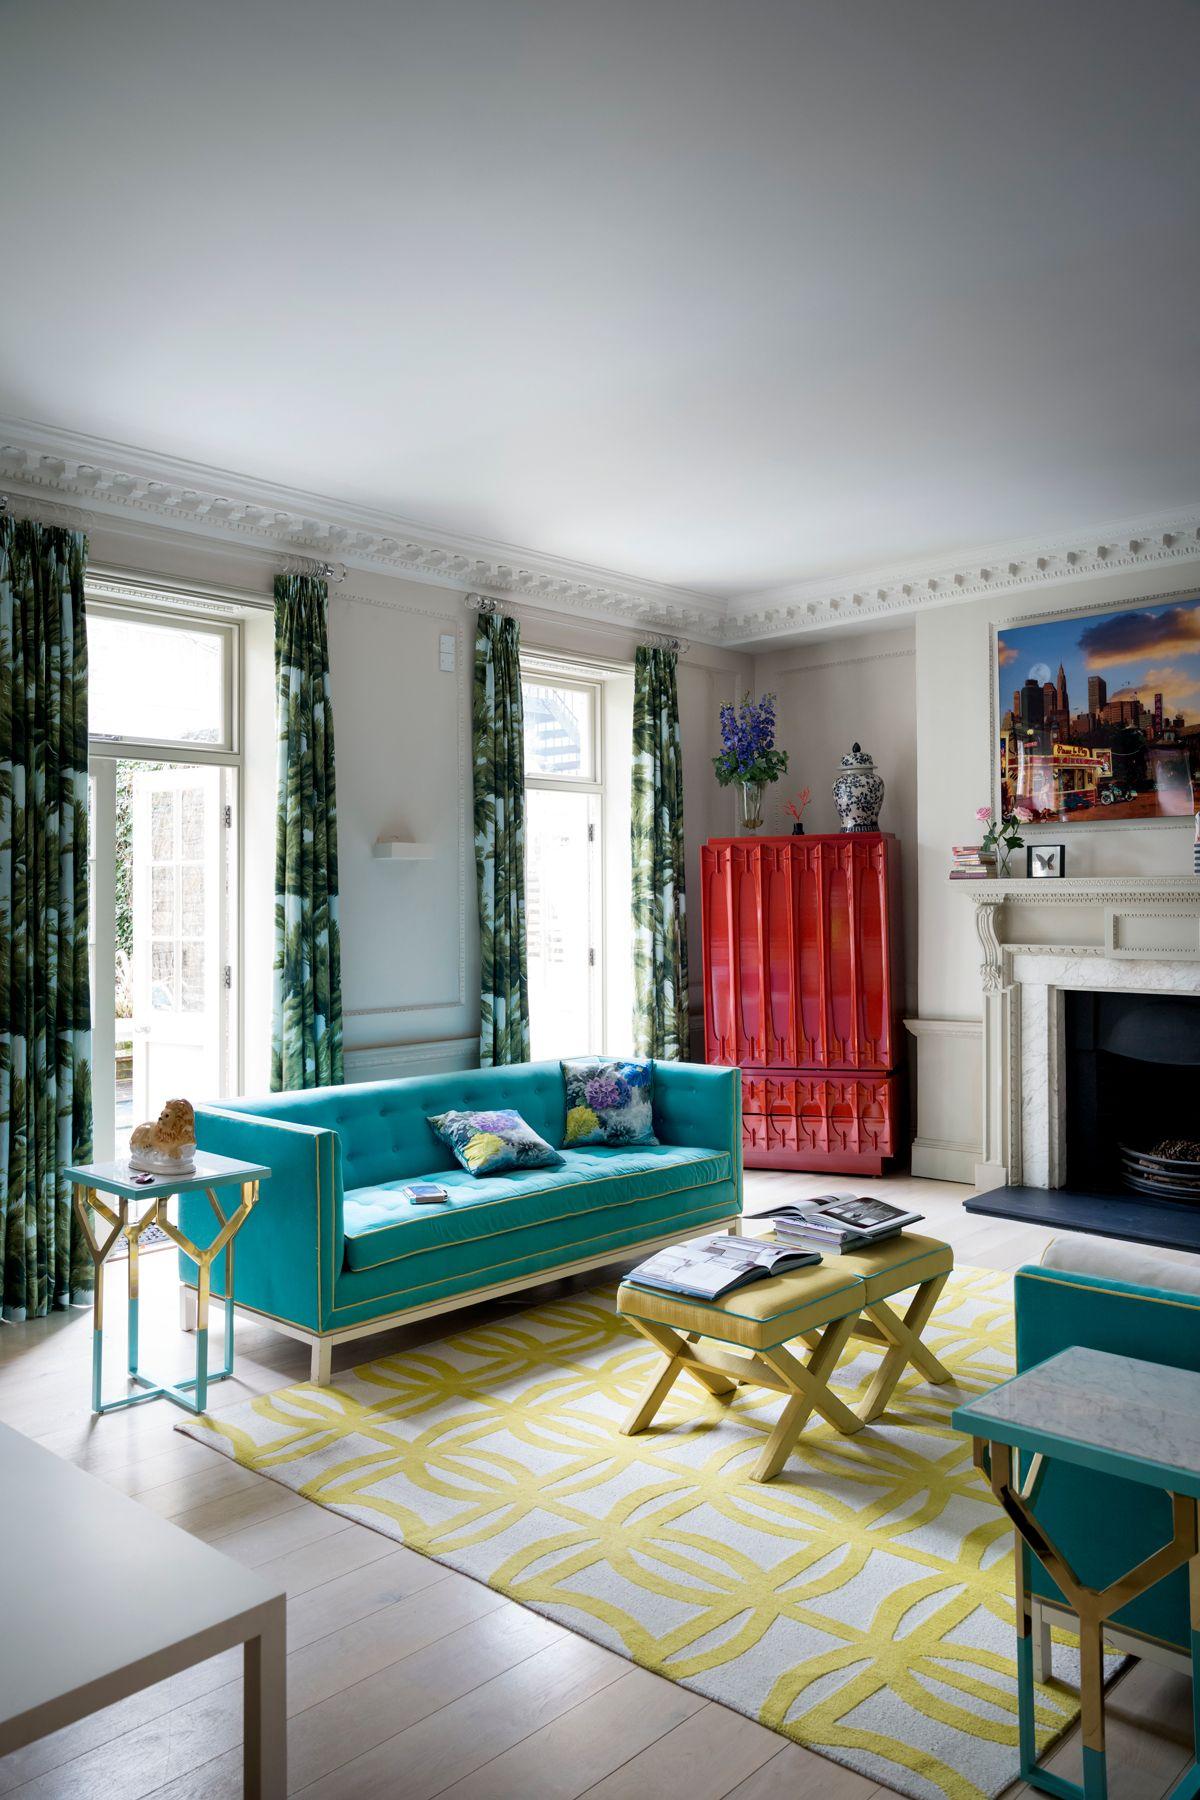 Explore this elegant Georgian house in central London